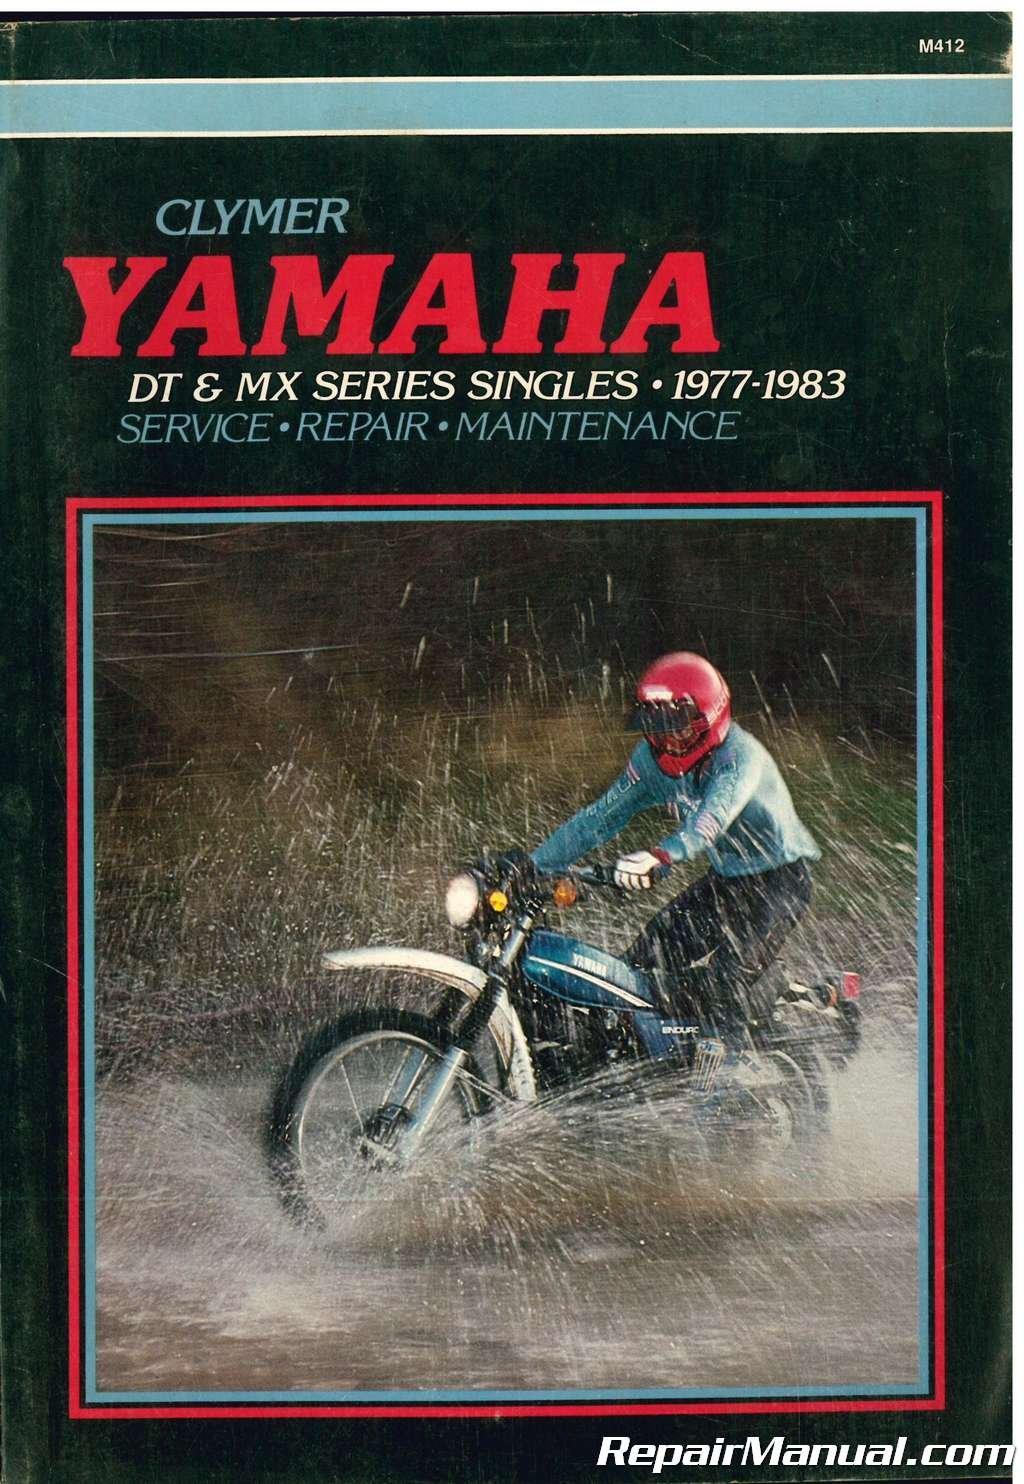 M412 1977 - 1983 Yamaha DT 100 125 175 250 400 MX100 175 Clymer Motorcycle Repair  Manual: Manufacturer: Amazon.com: Books